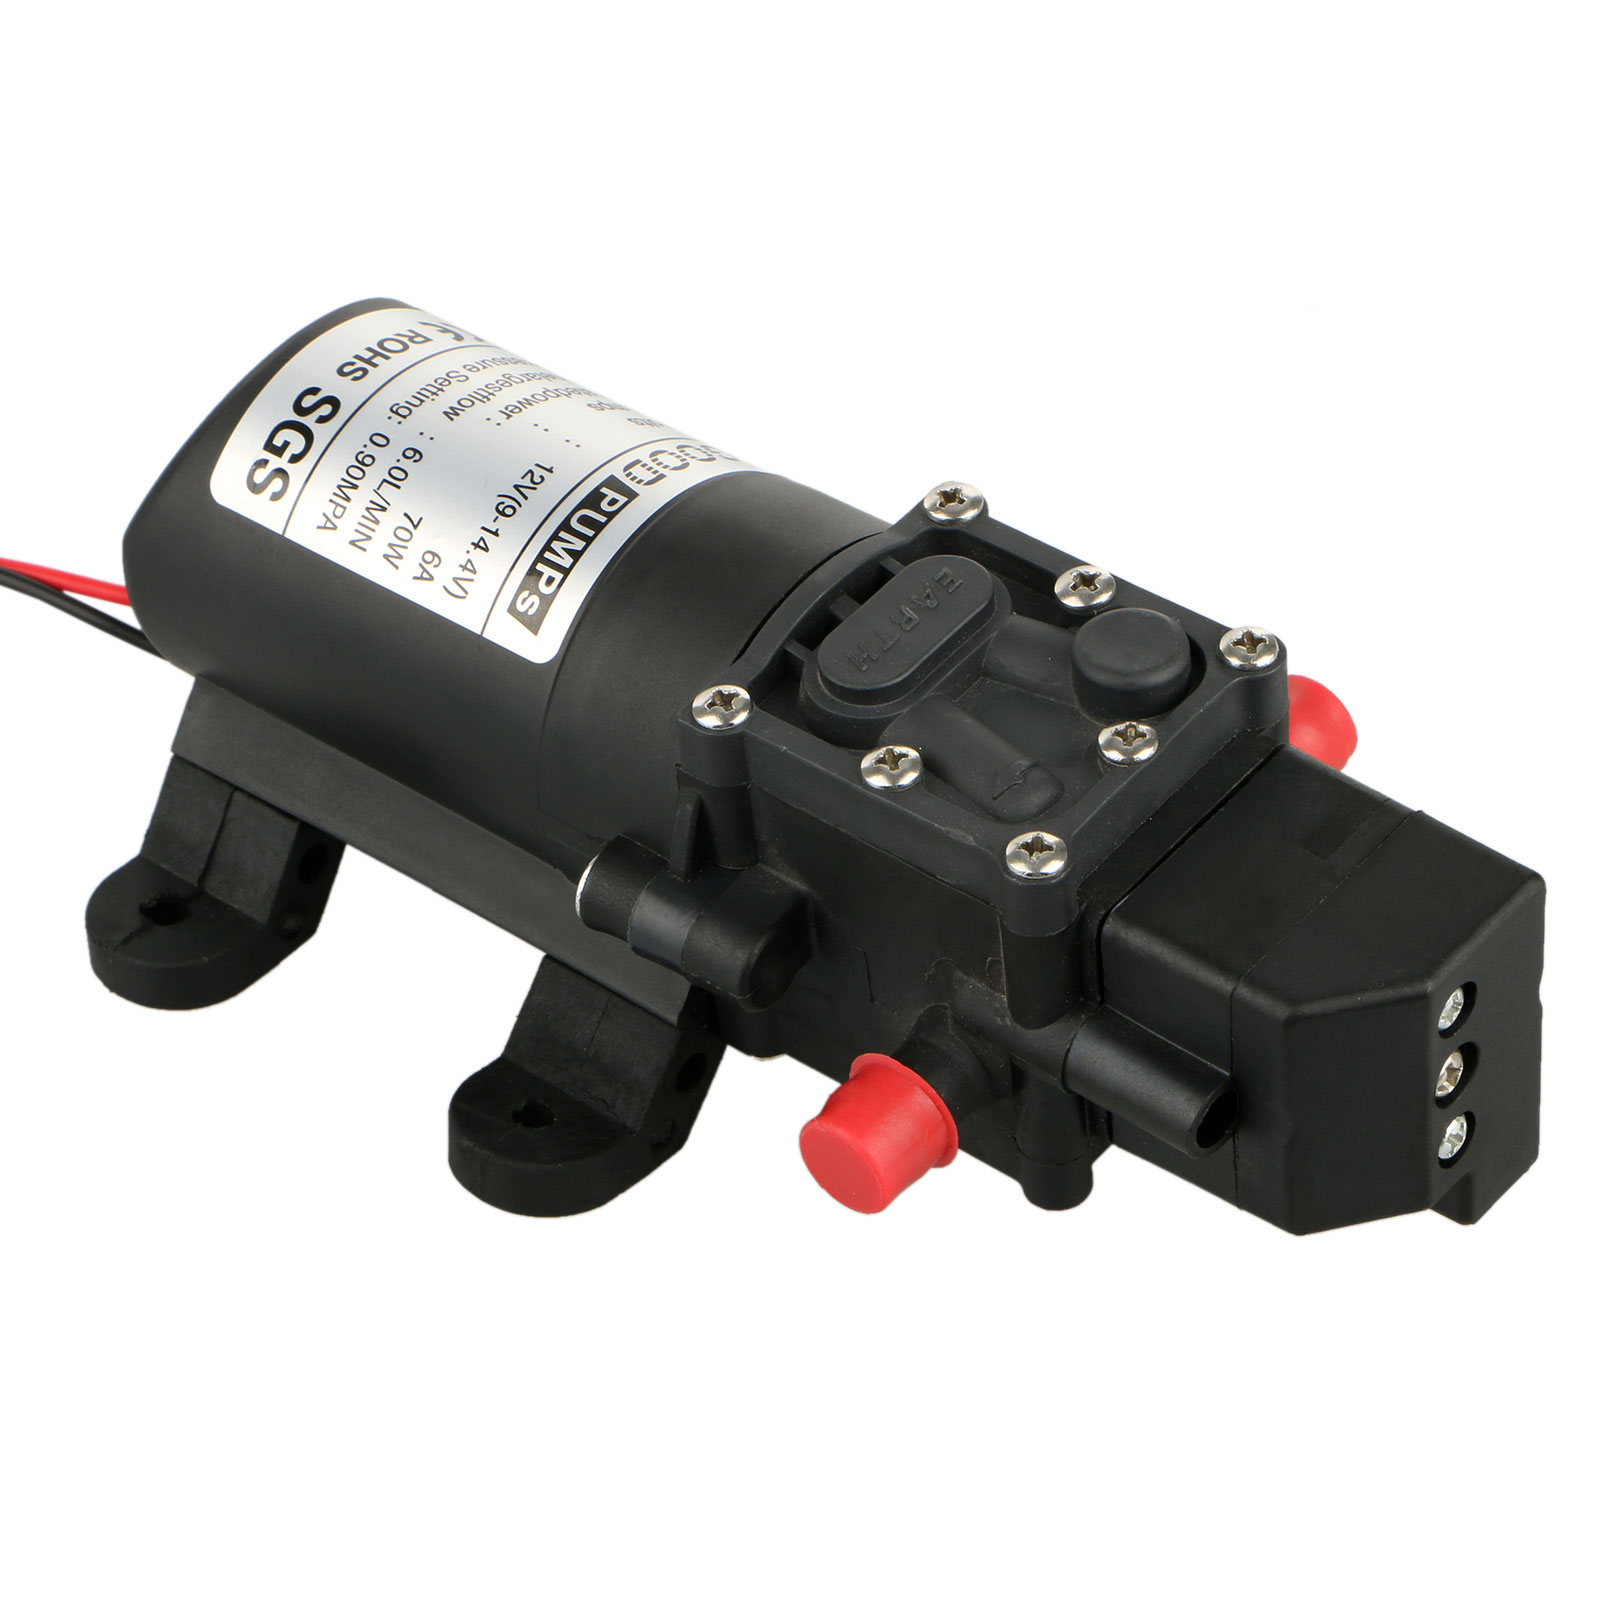 Diaphragm High Pressure Self Priming Agricultural Electric Sprayer Water Pump A